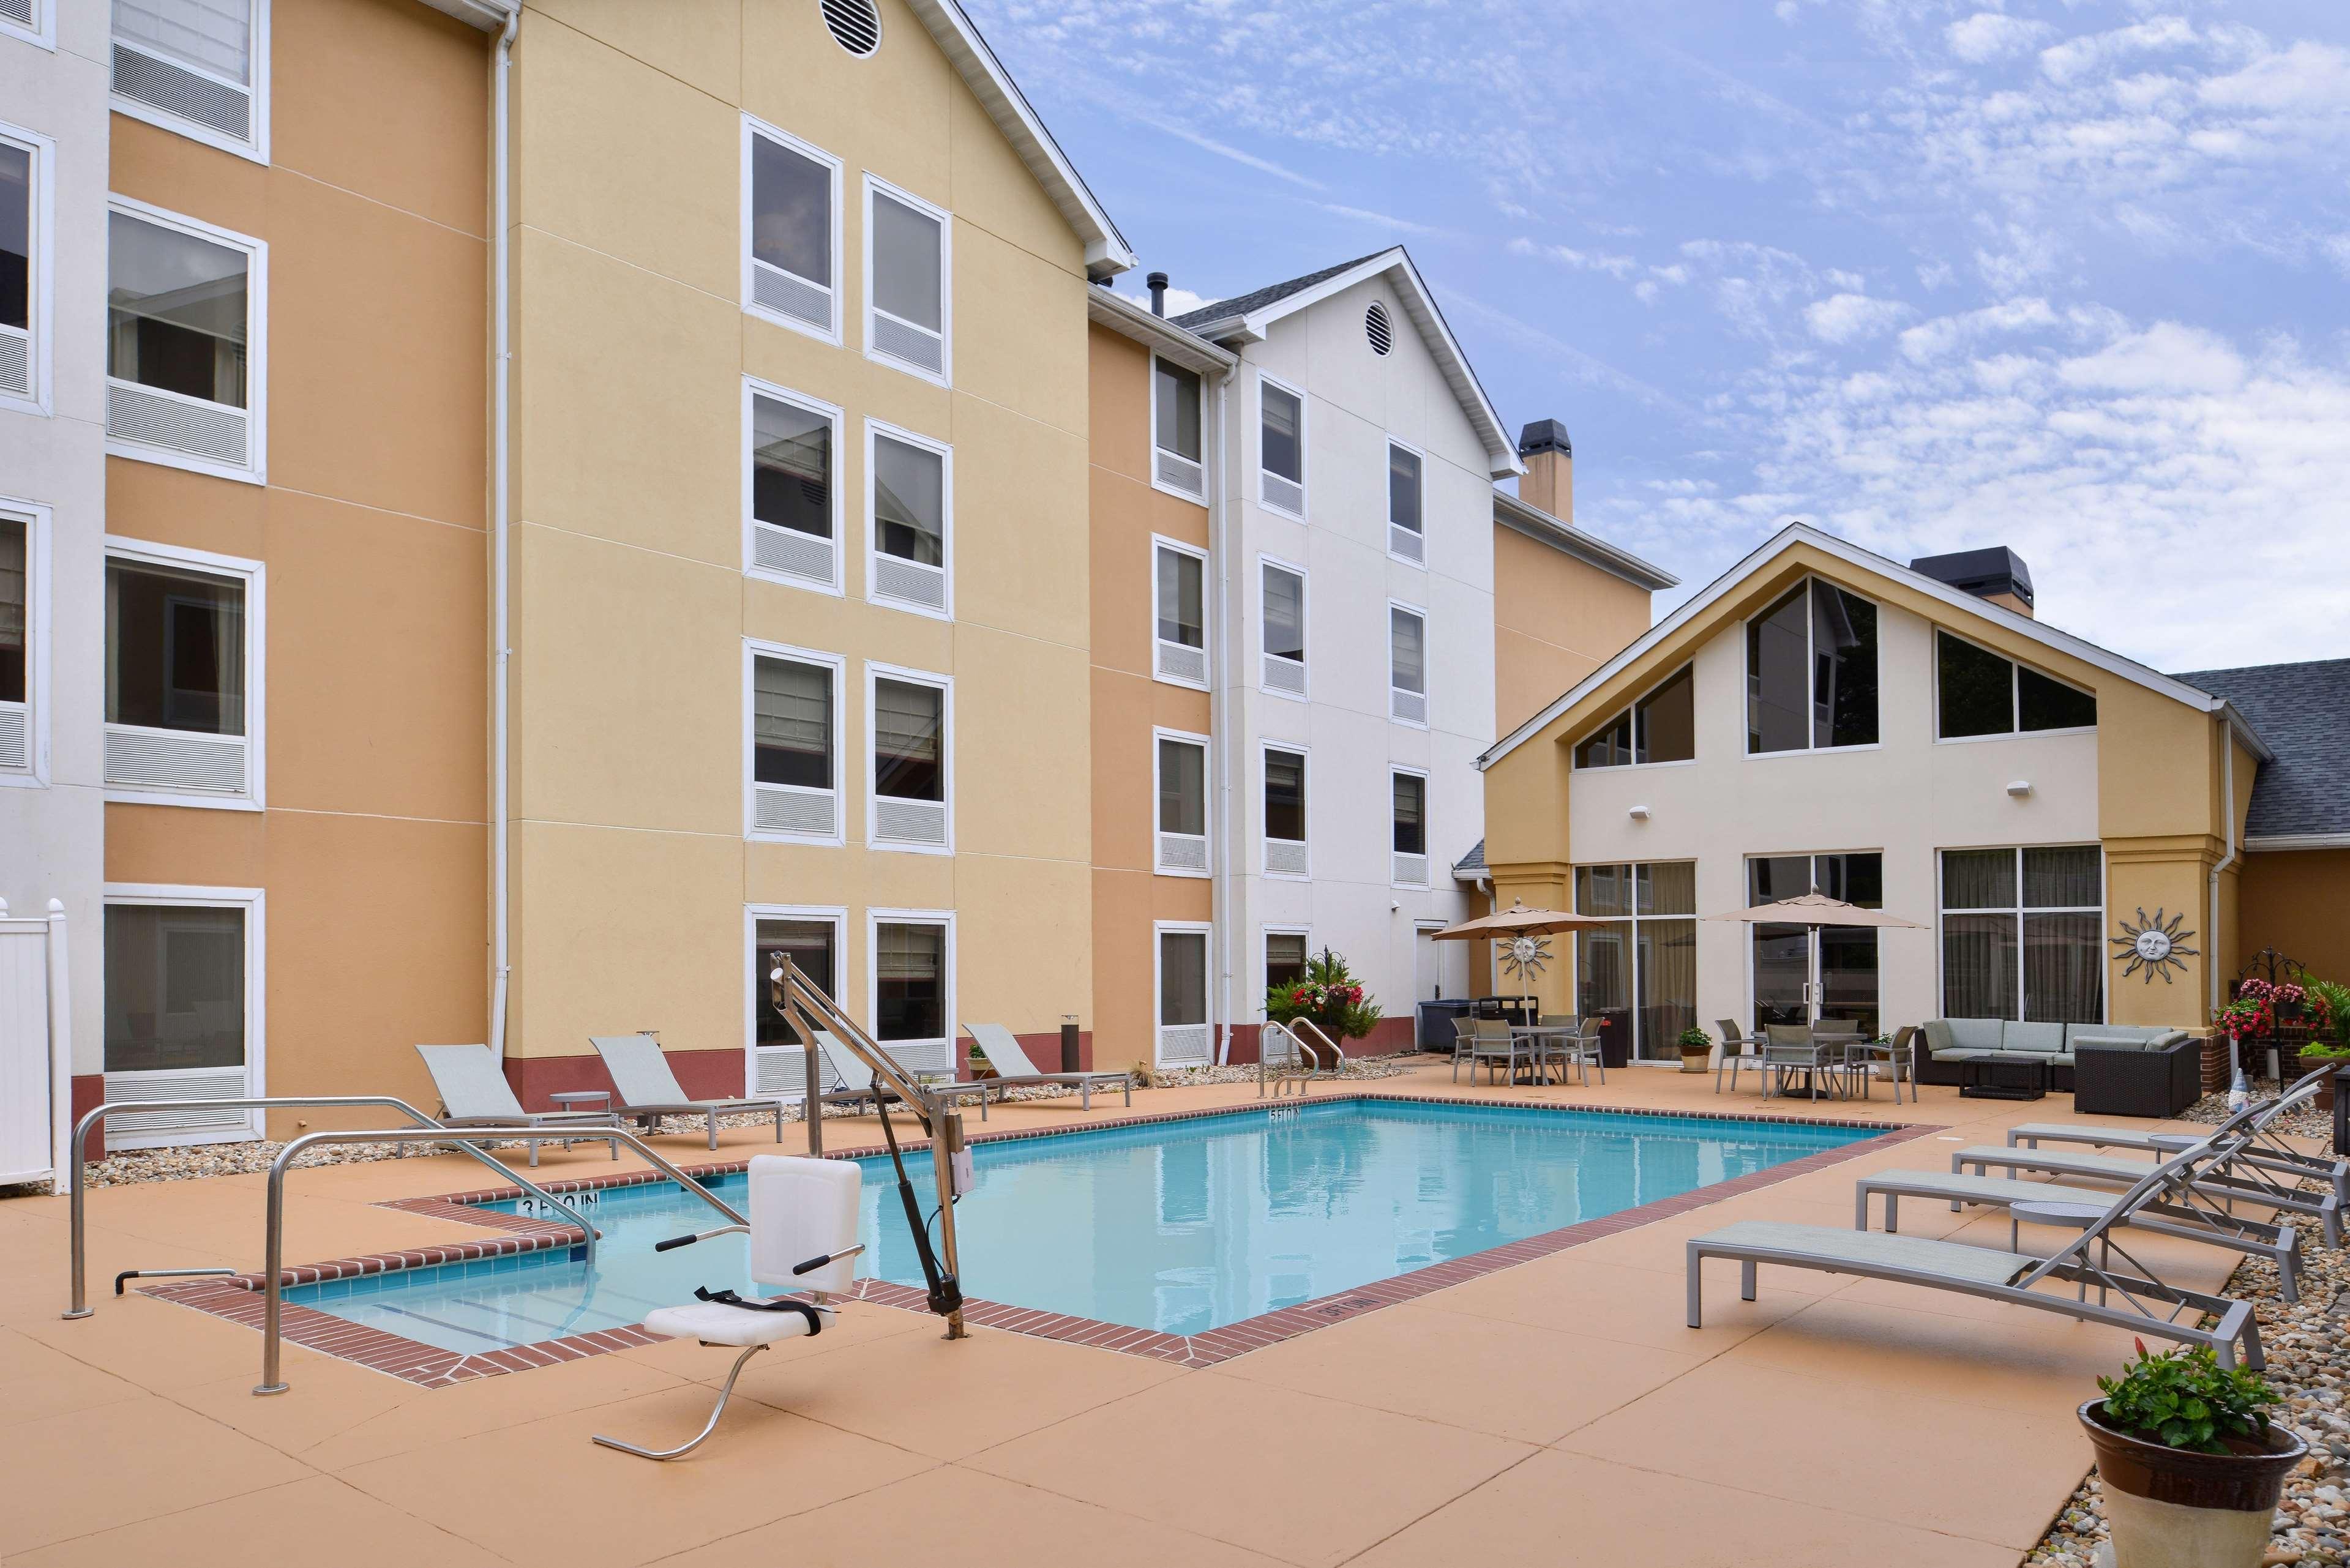 Hampton Inn & Suites Newport News (Oyster Point) image 7